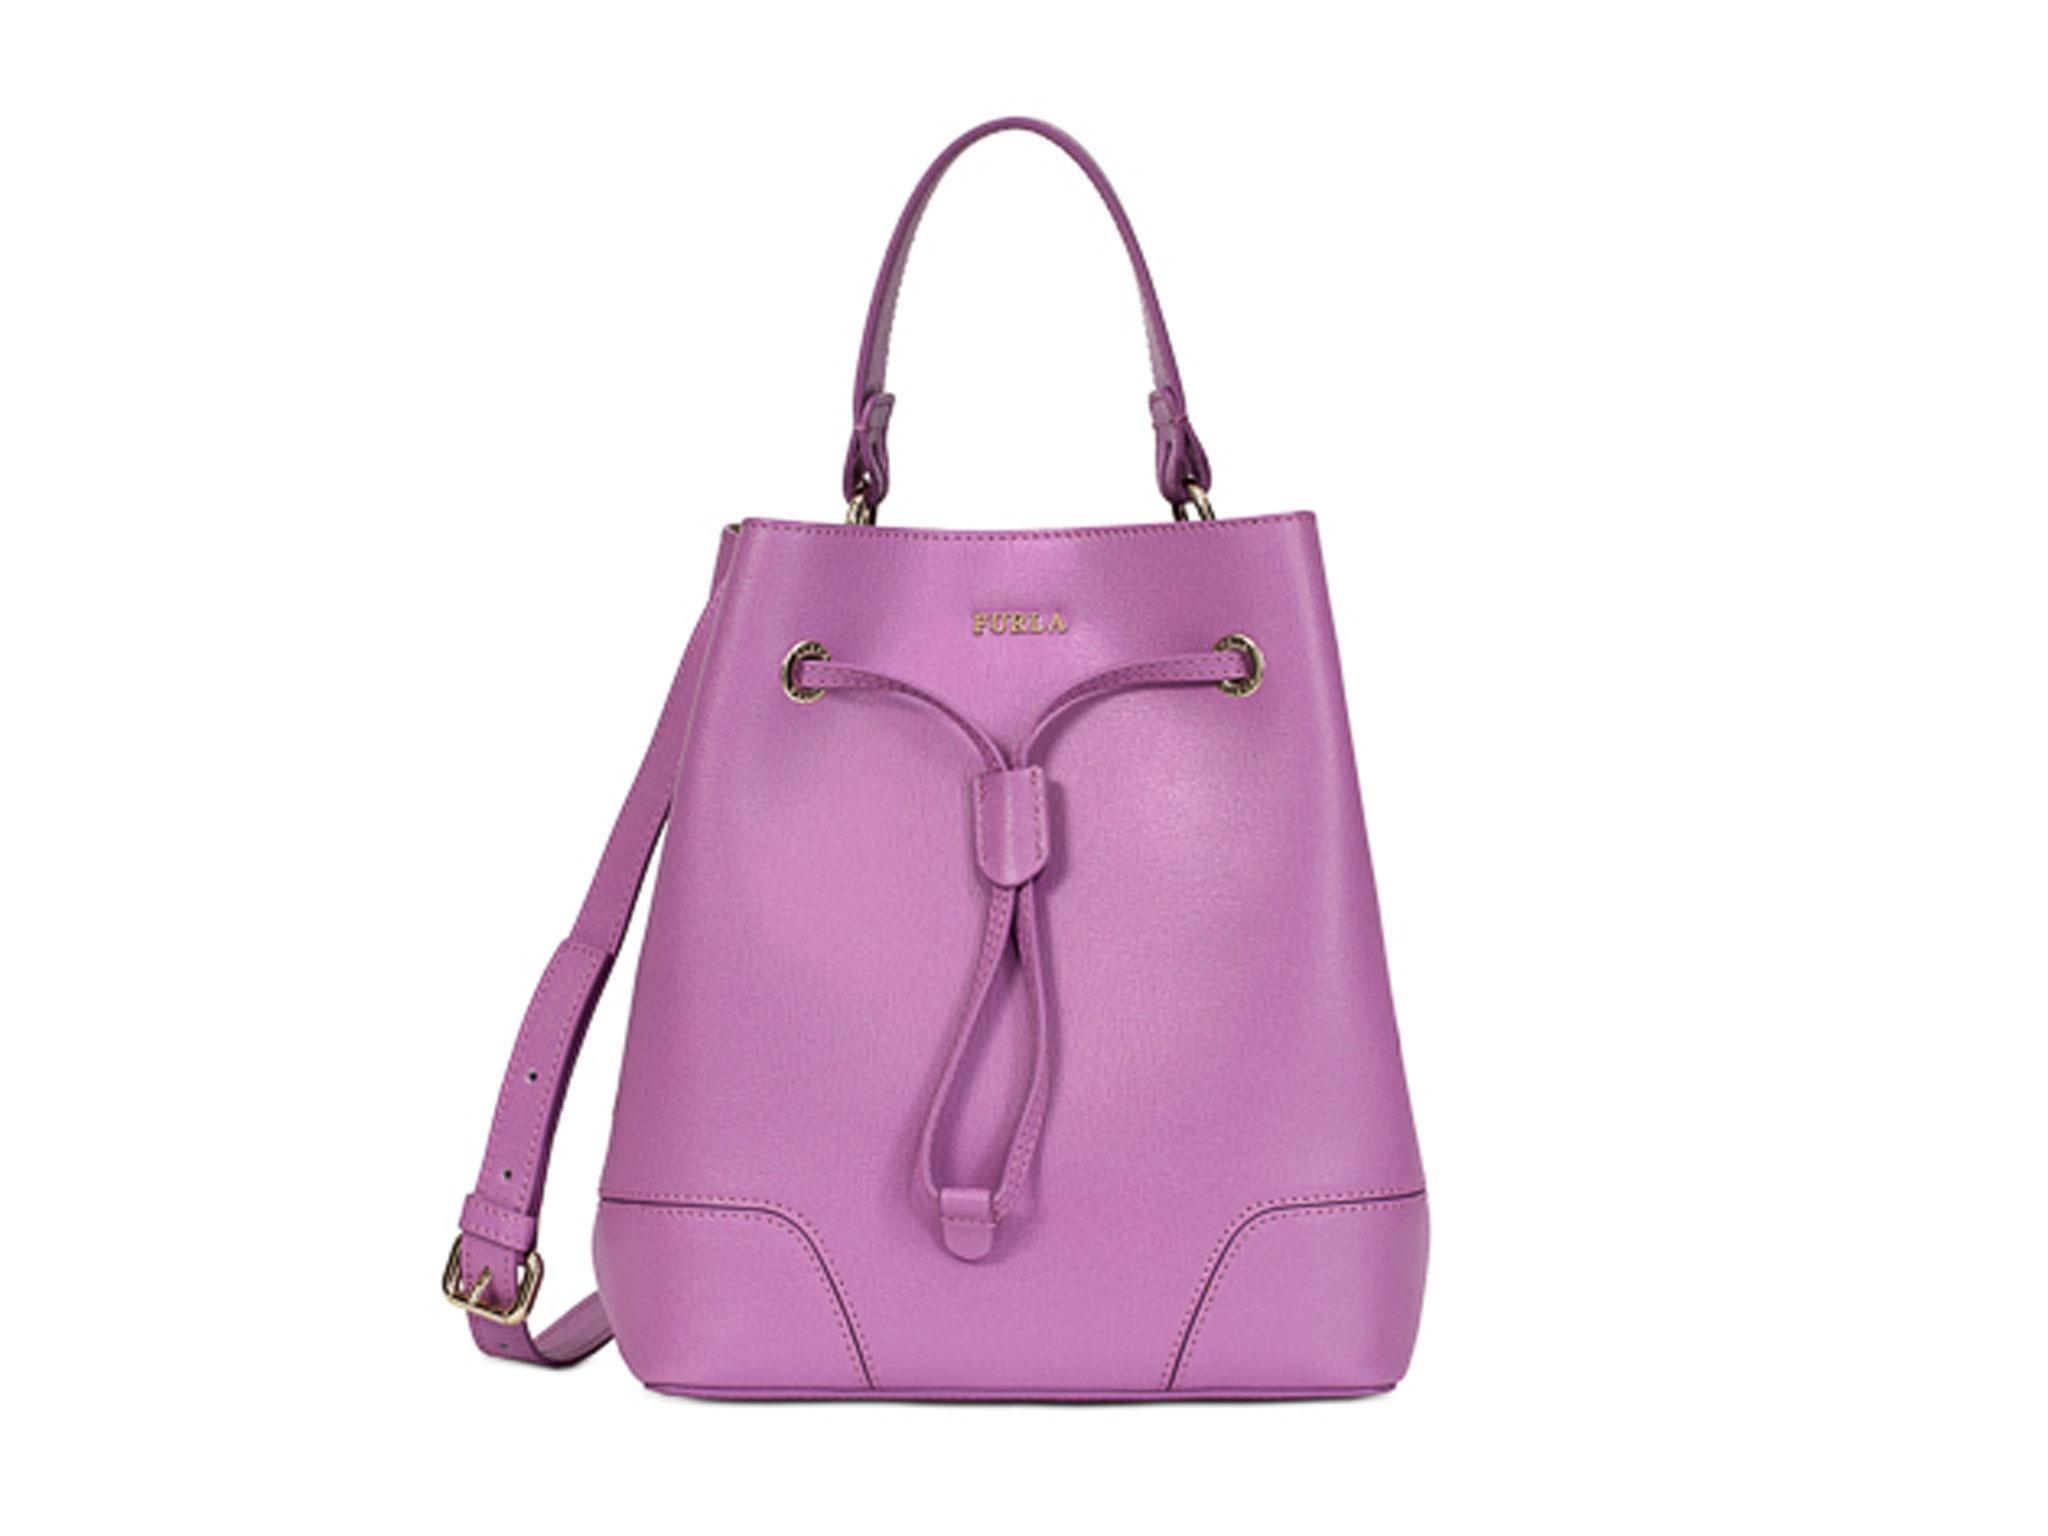 82ad45a0de7 10 best spring handbags | The Independent